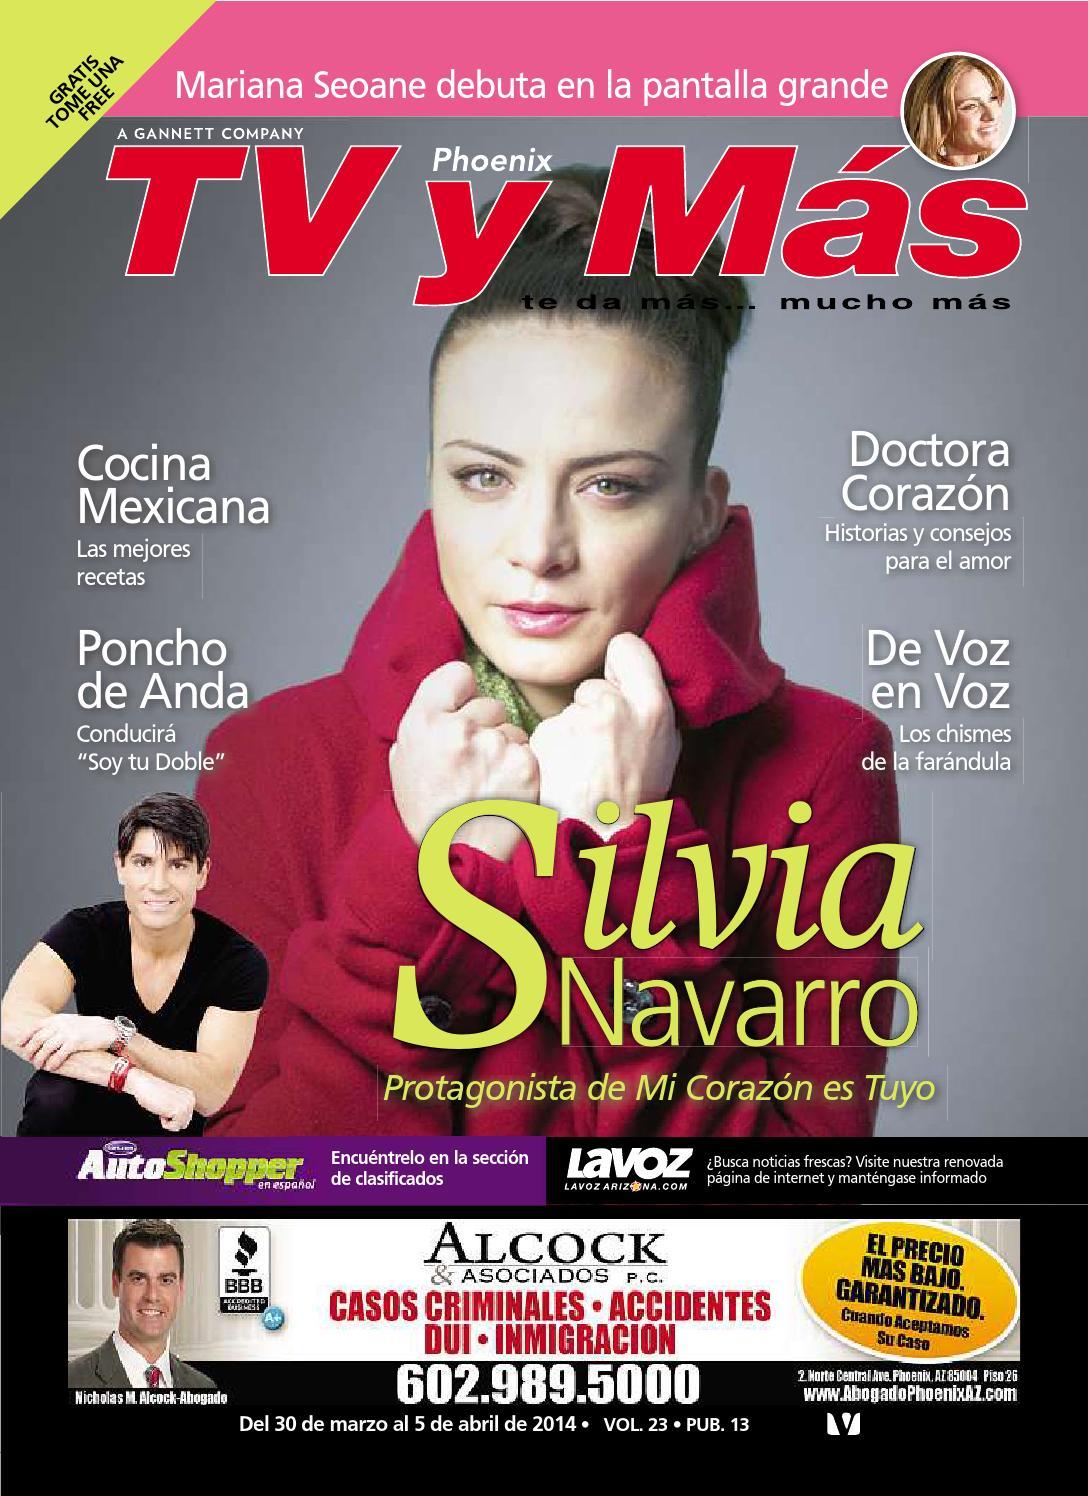 Amor A La Mexicana Movie 03302014 tvymas valleywidela voz publishing - issuu